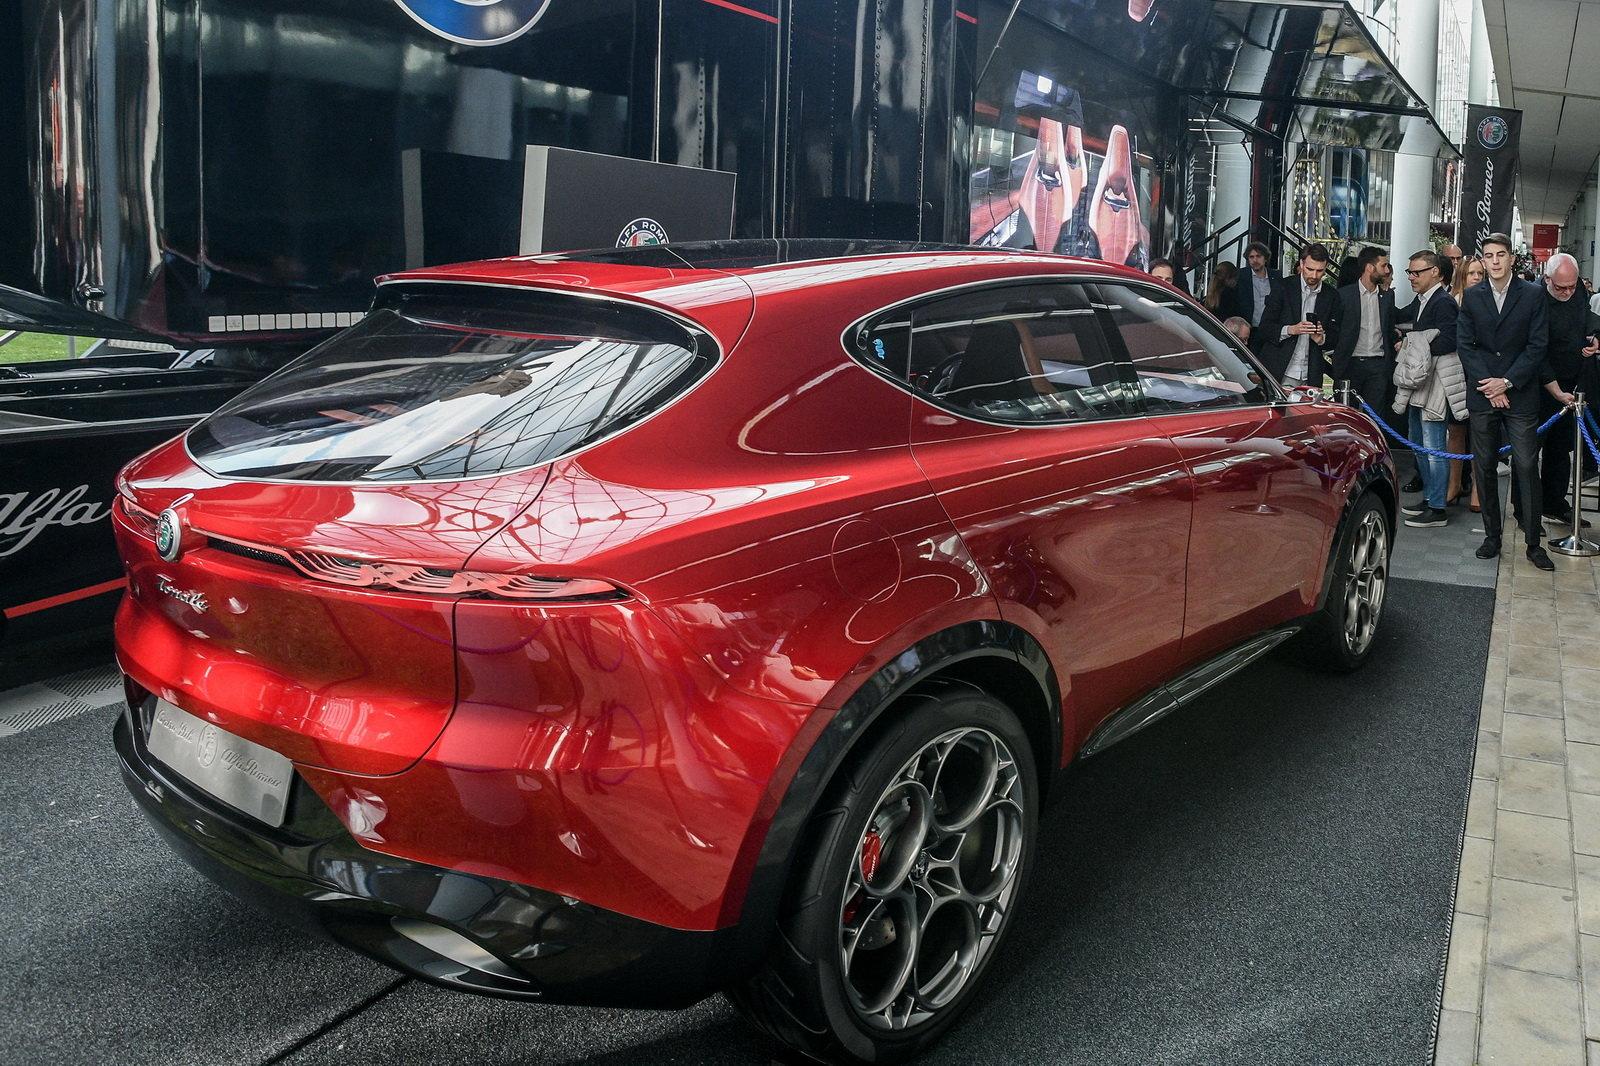 Foto - L'Alfa Romeo Tonale fa una capatina a Milano